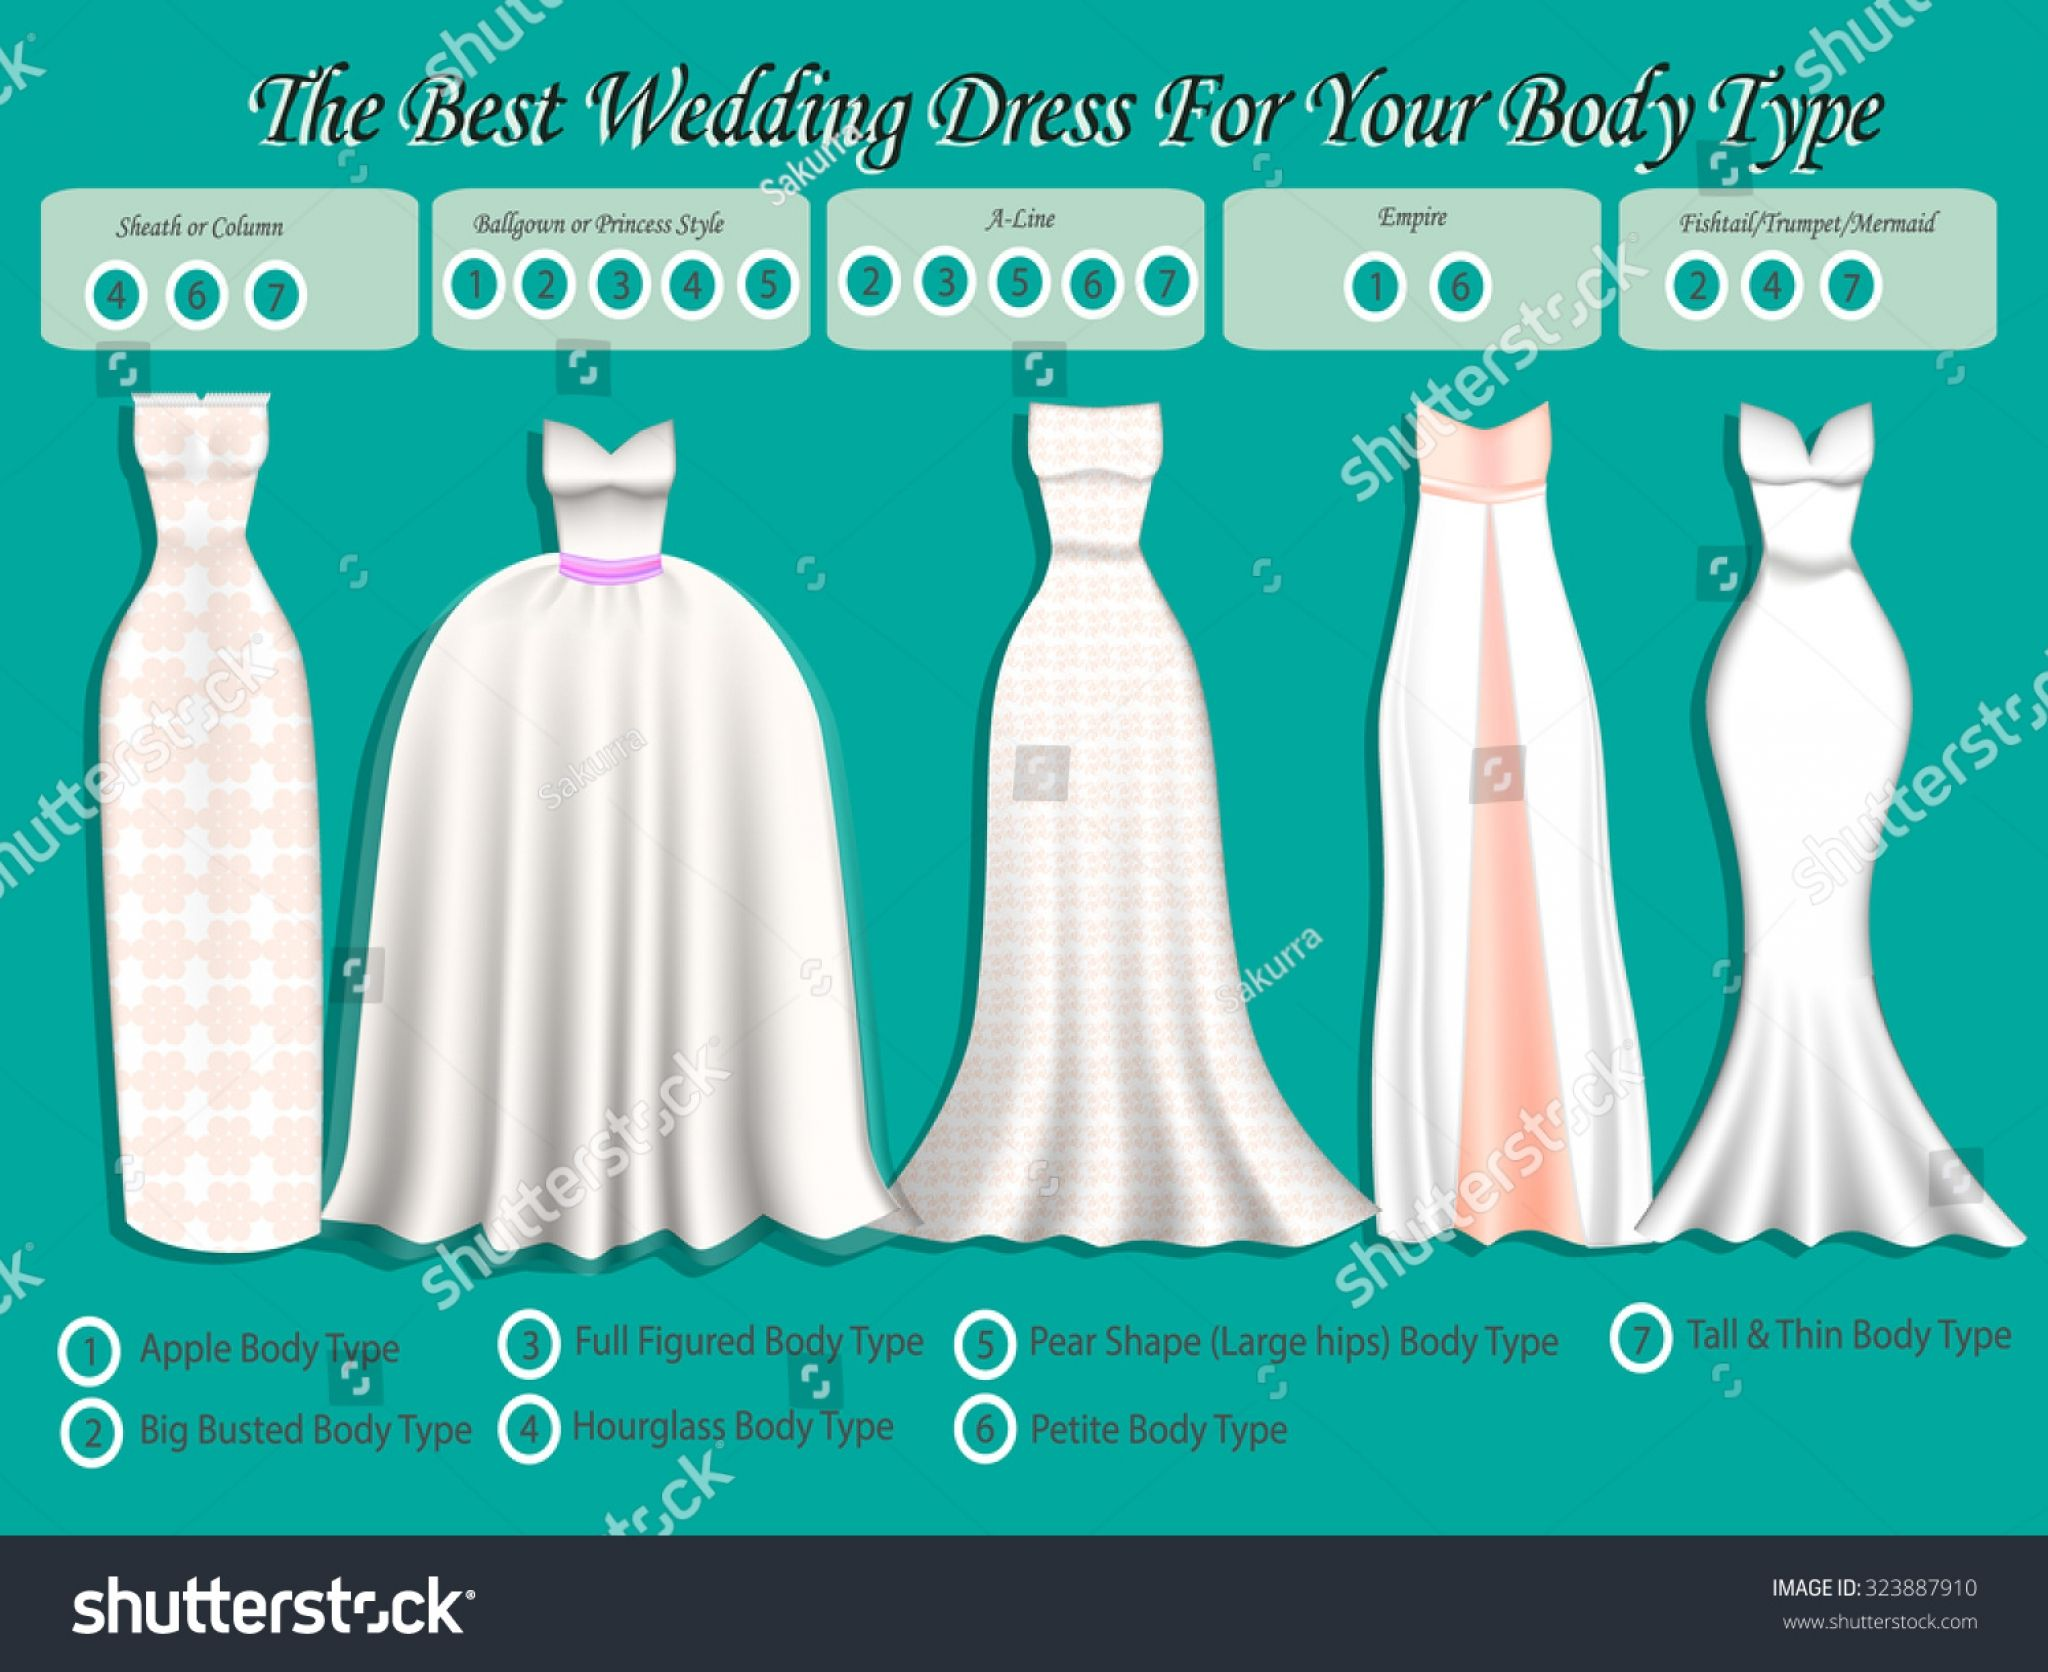 Sheath Wedding Dress Body Type Dressy Dresses For Weddings Check More At Http Svesty C Dress For Body Shape Wedding Dress Body Type Dresses For Apple Shape [ 1672 x 2048 Pixel ]